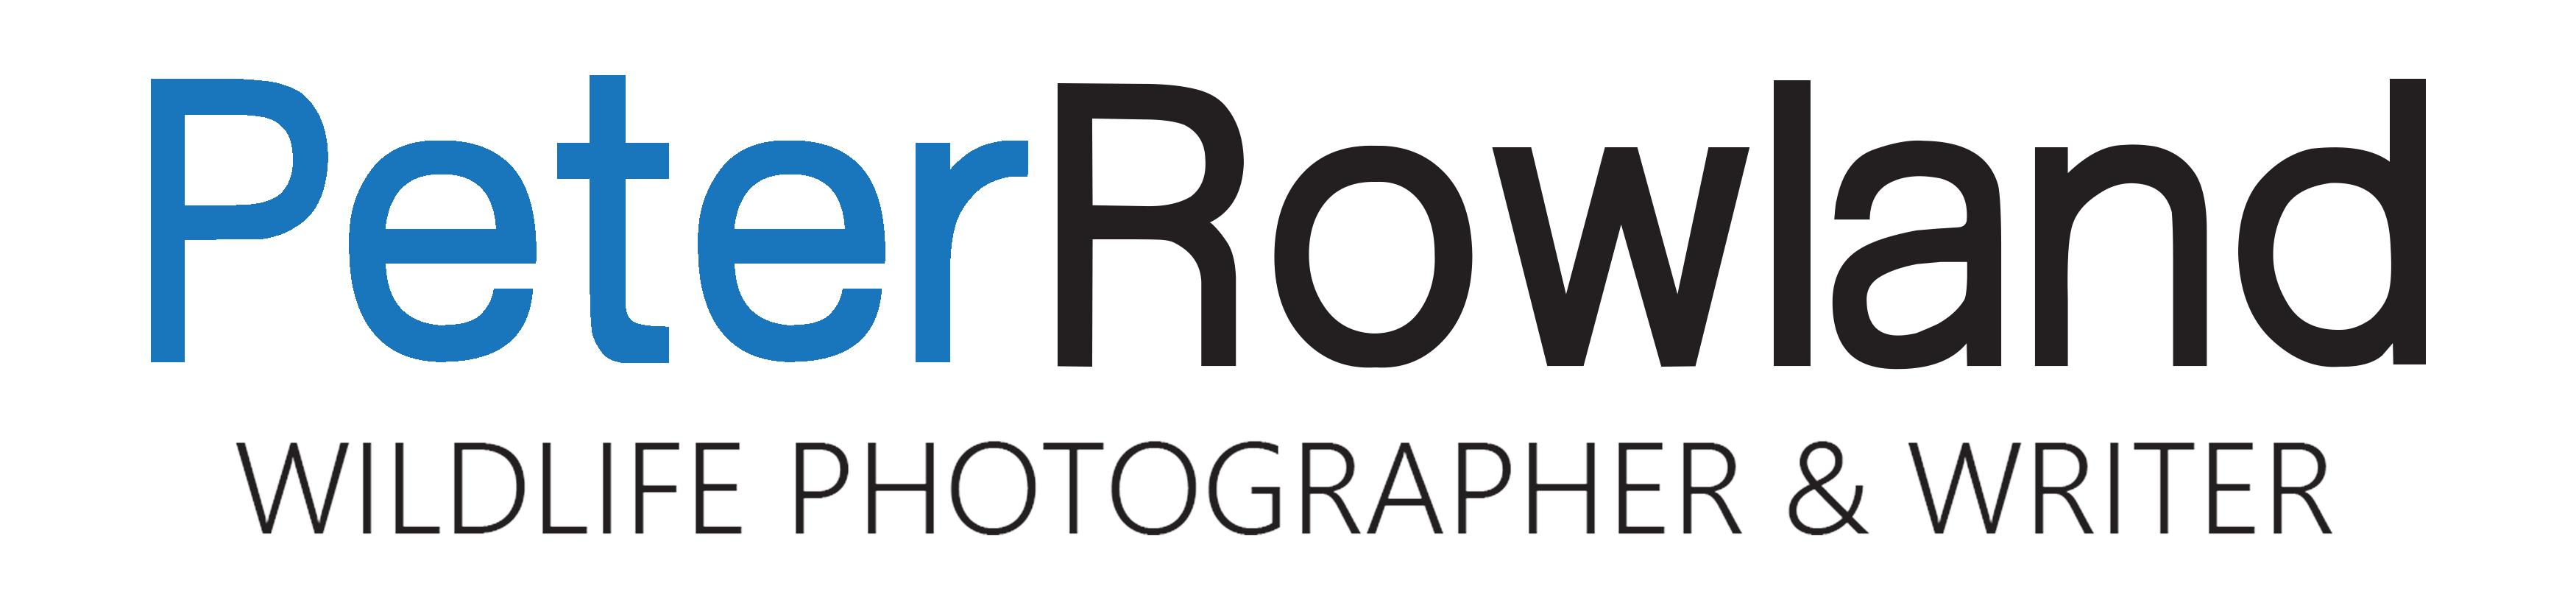 Peter Rowland Photographer & Writer